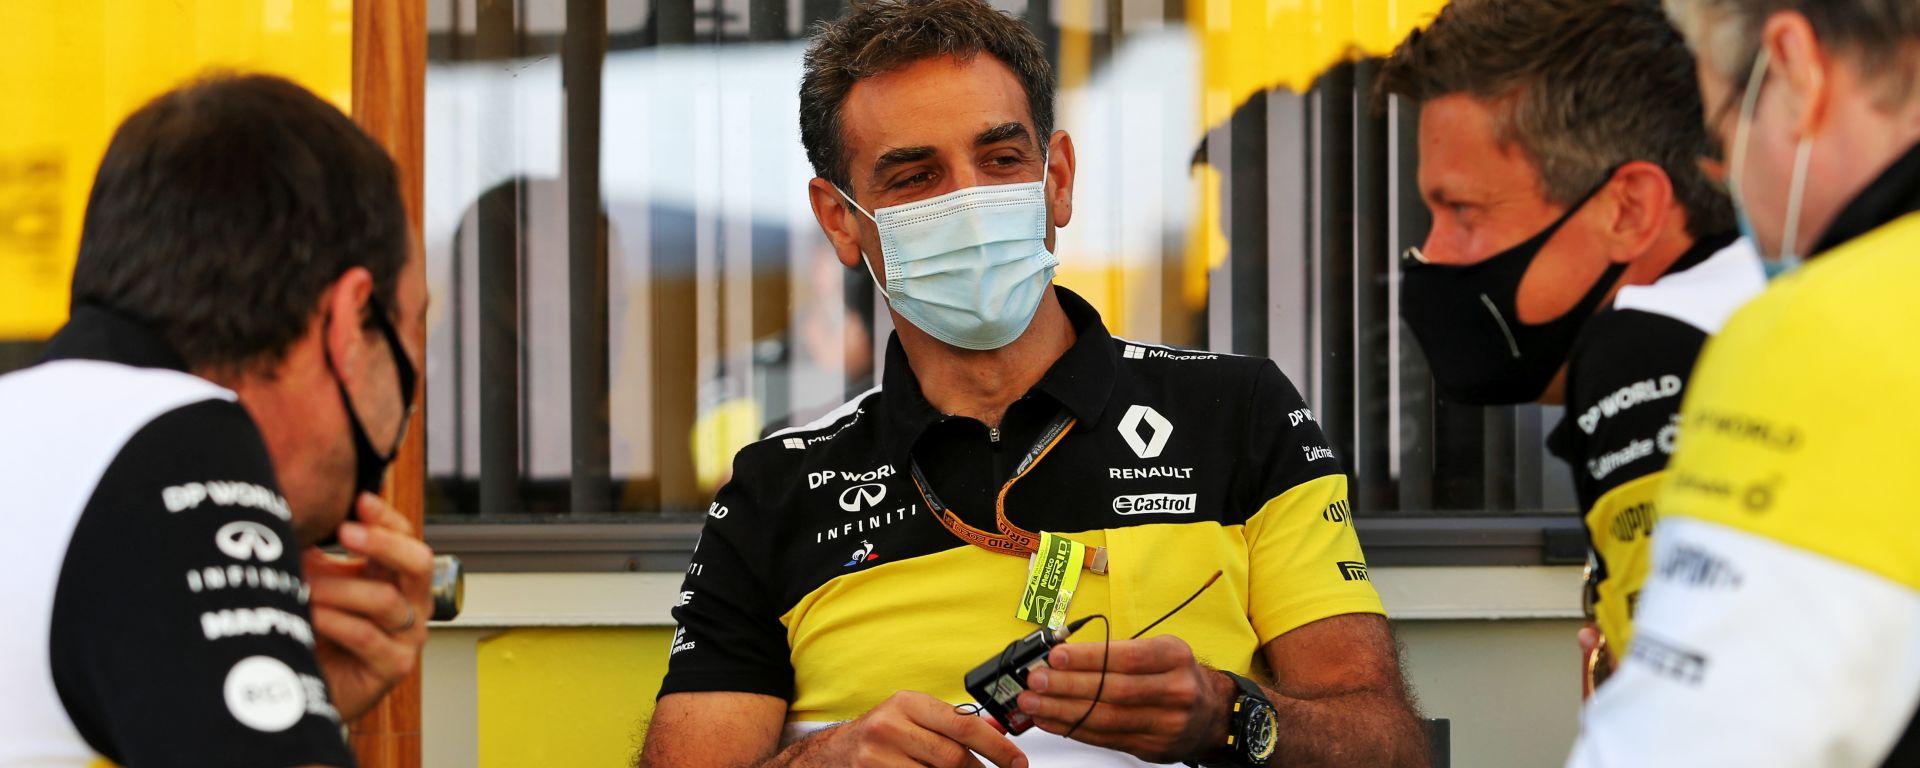 F1 2020: Cyril Abiteboul e Marcin Budkowski (Renault)